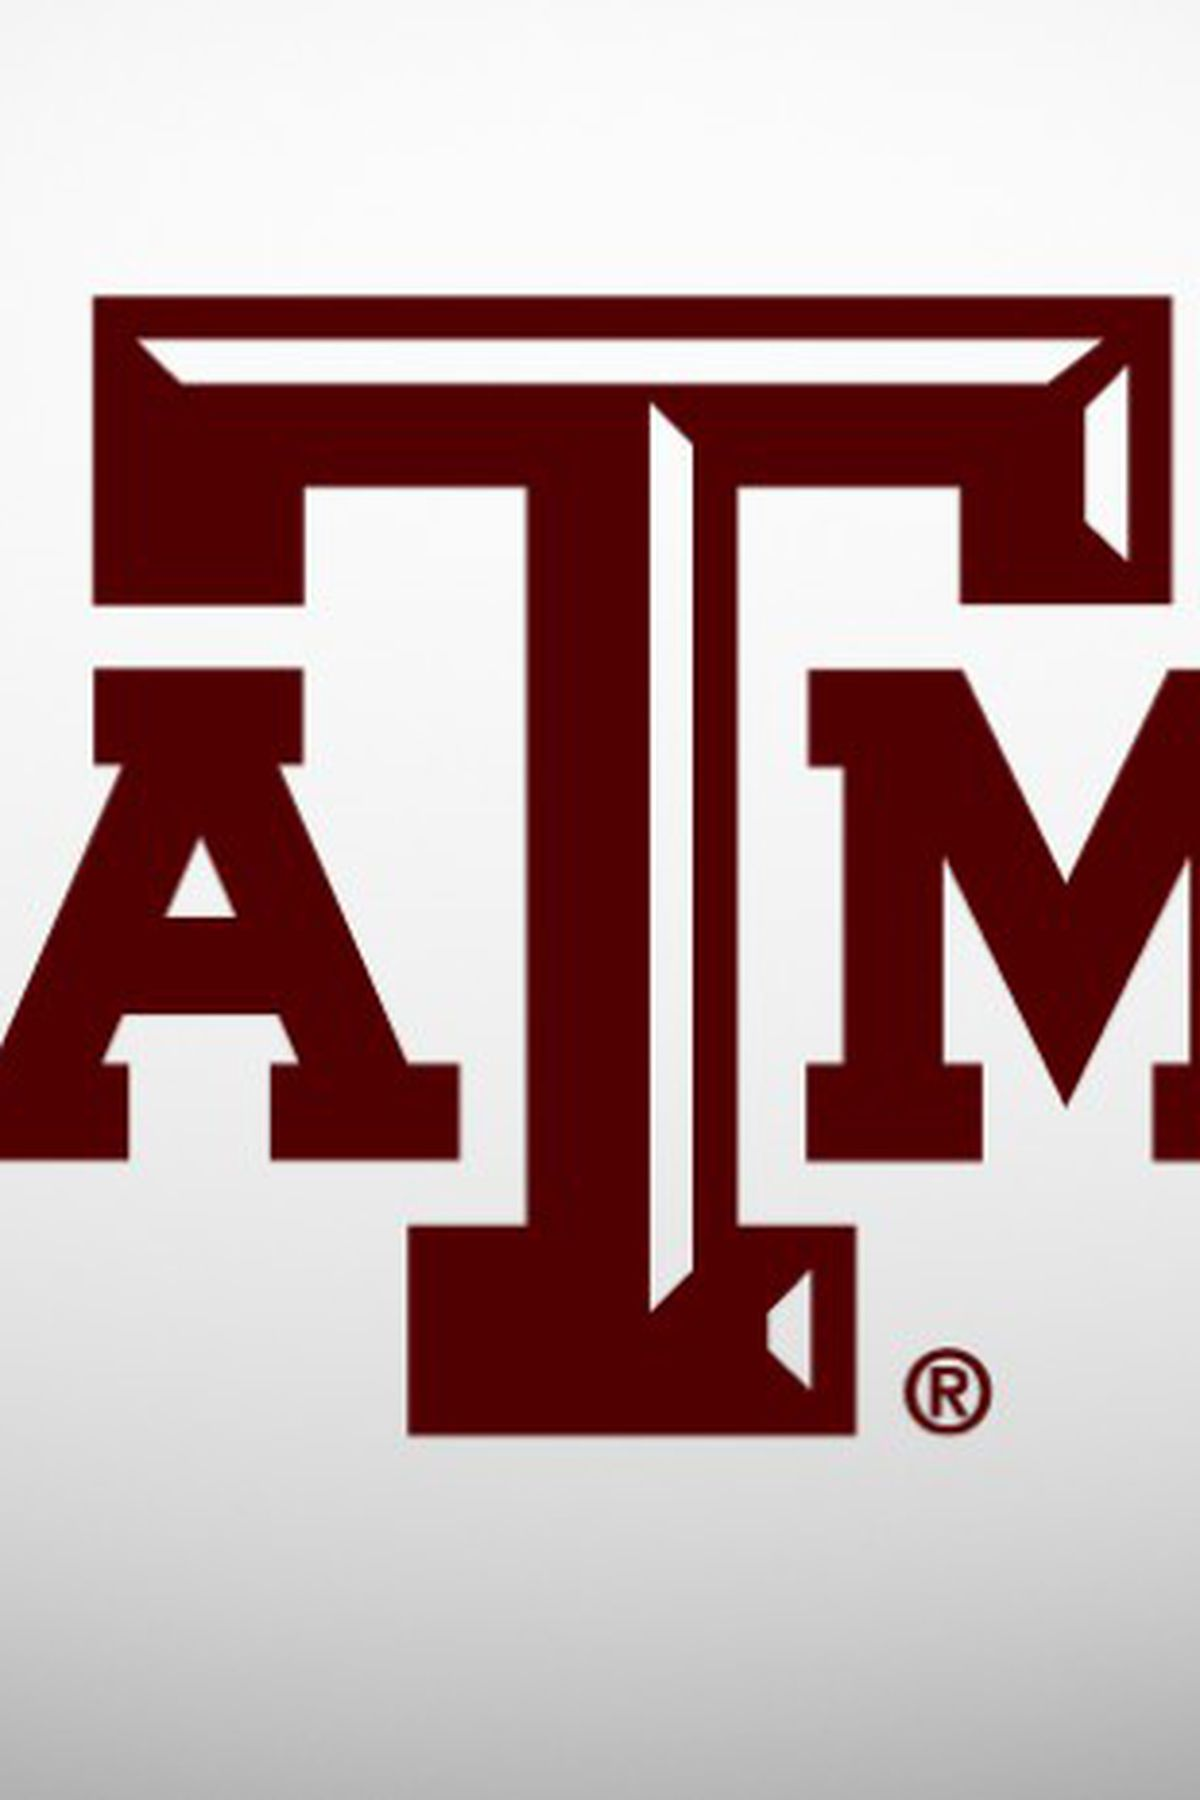 Texas A&M announces calendar changes, spring break one day